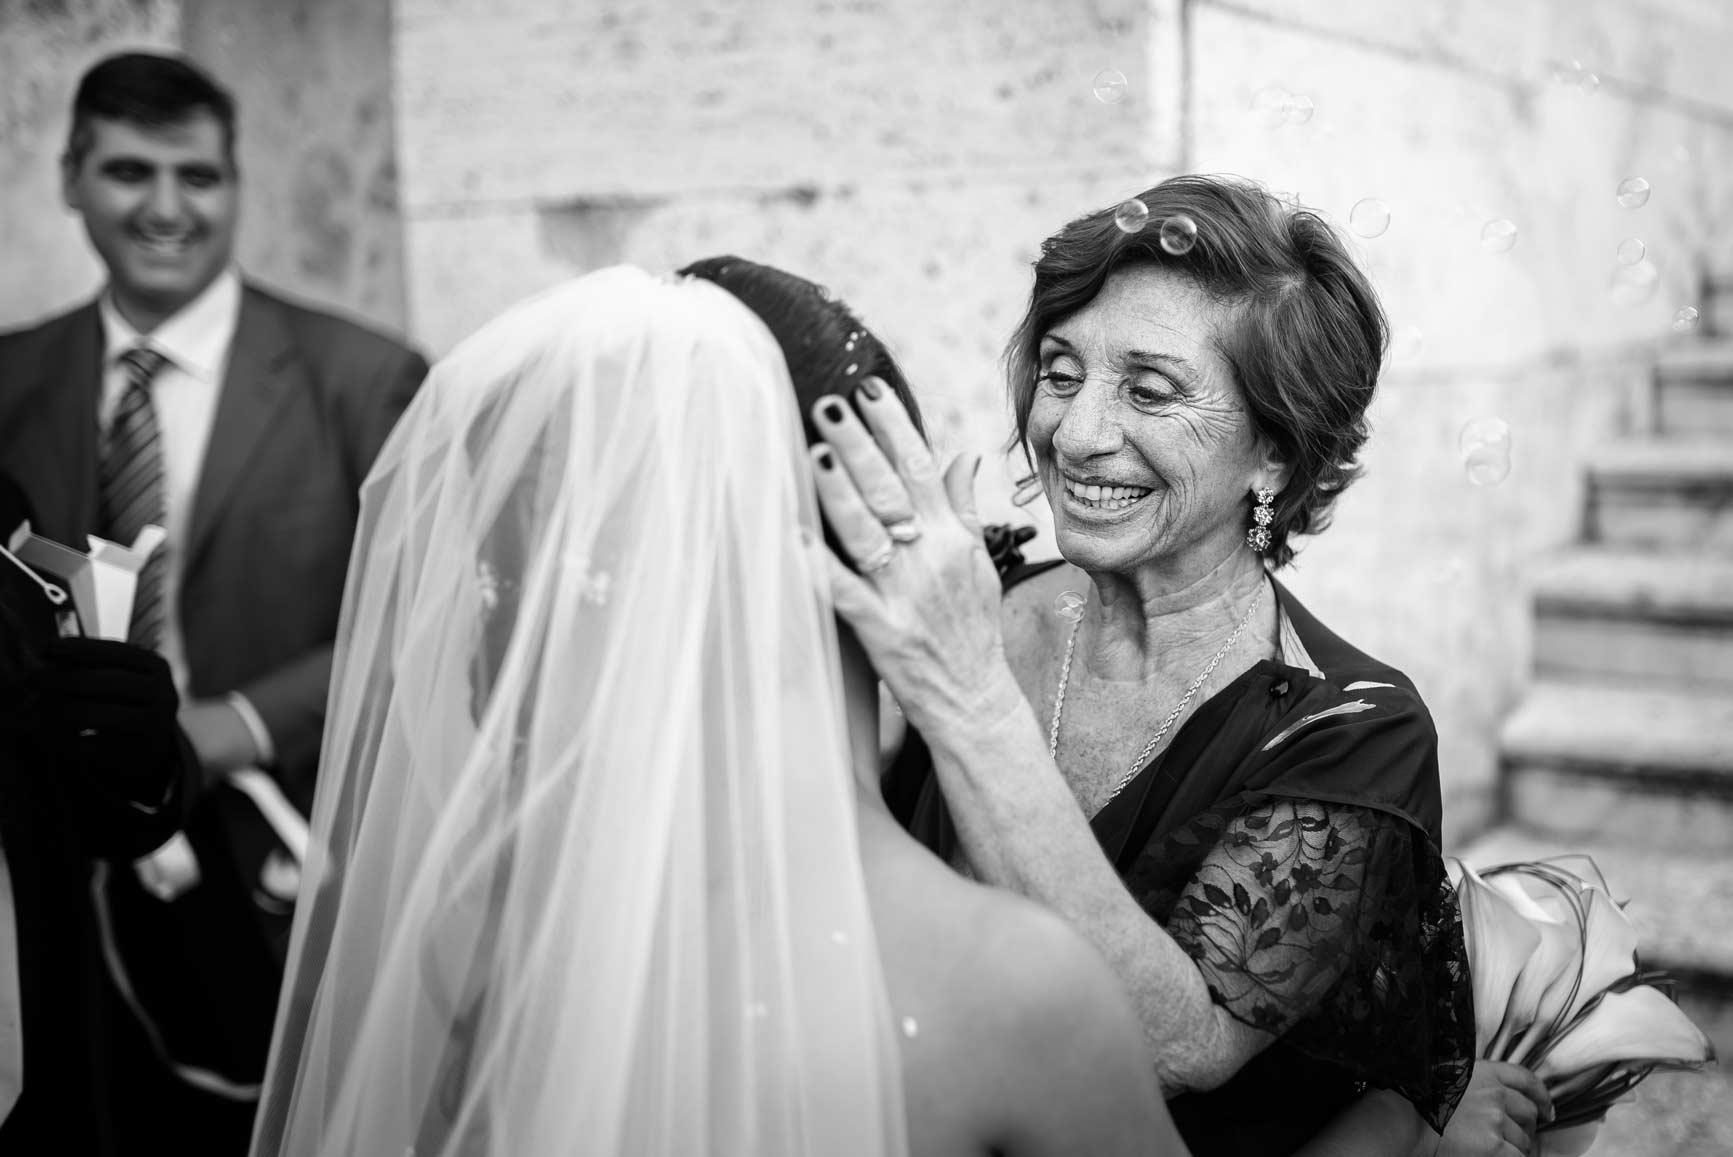 Matrimonio-Fotografo-Roma-Reportage-Cerimonia